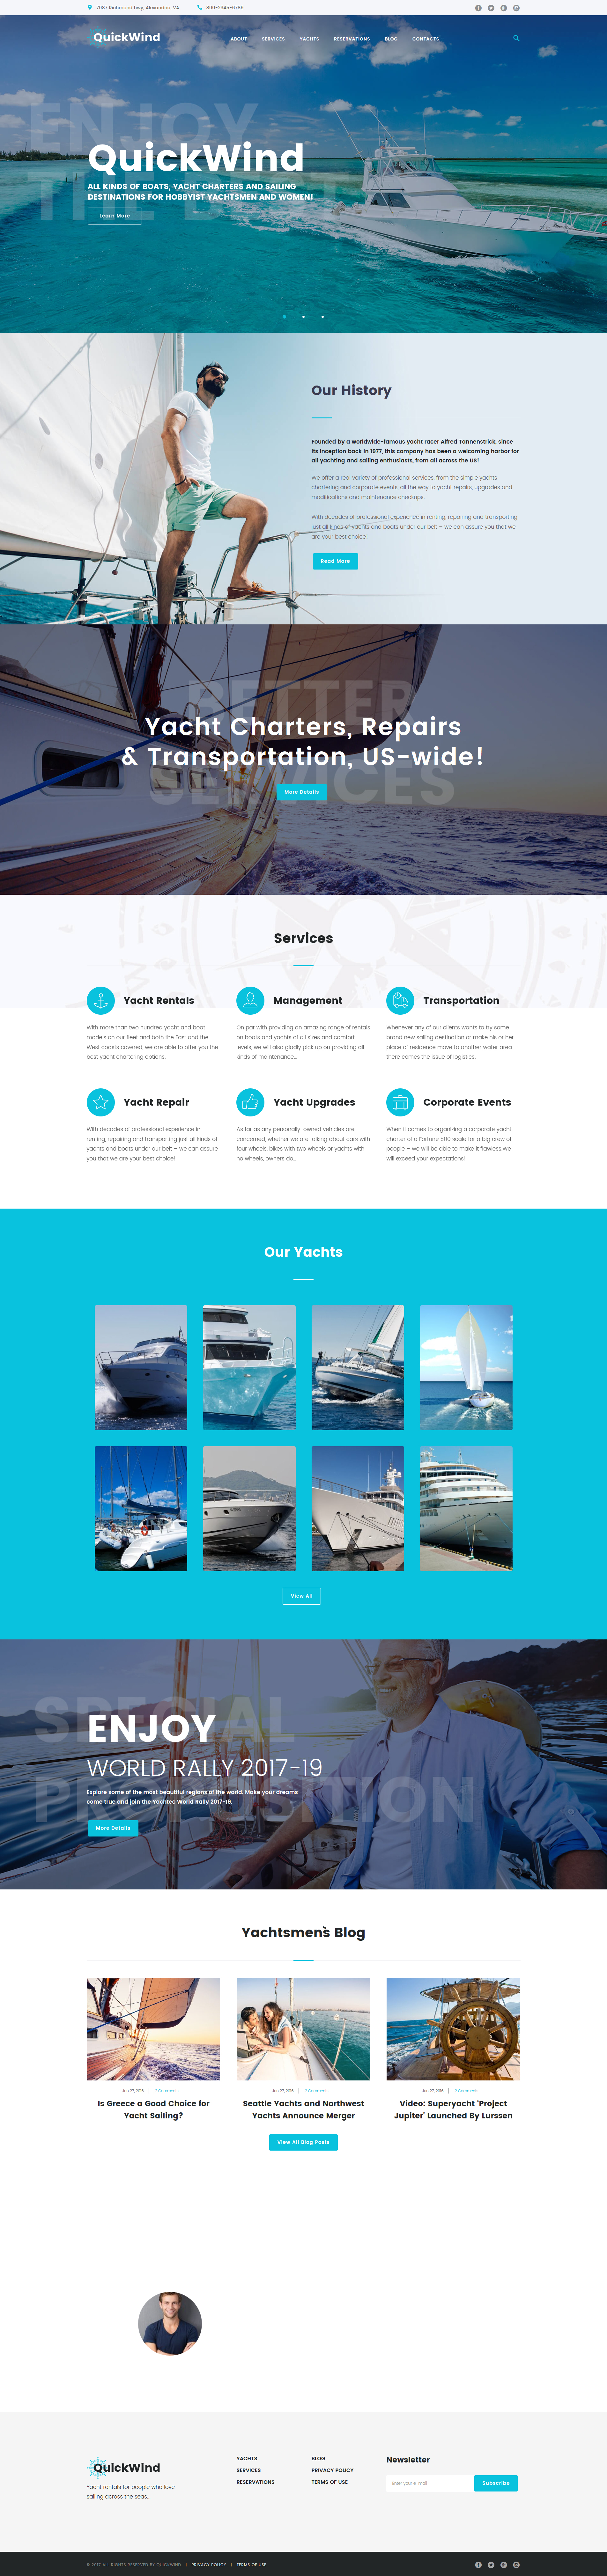 Yachting & Voyage Charter №62365 - скриншот